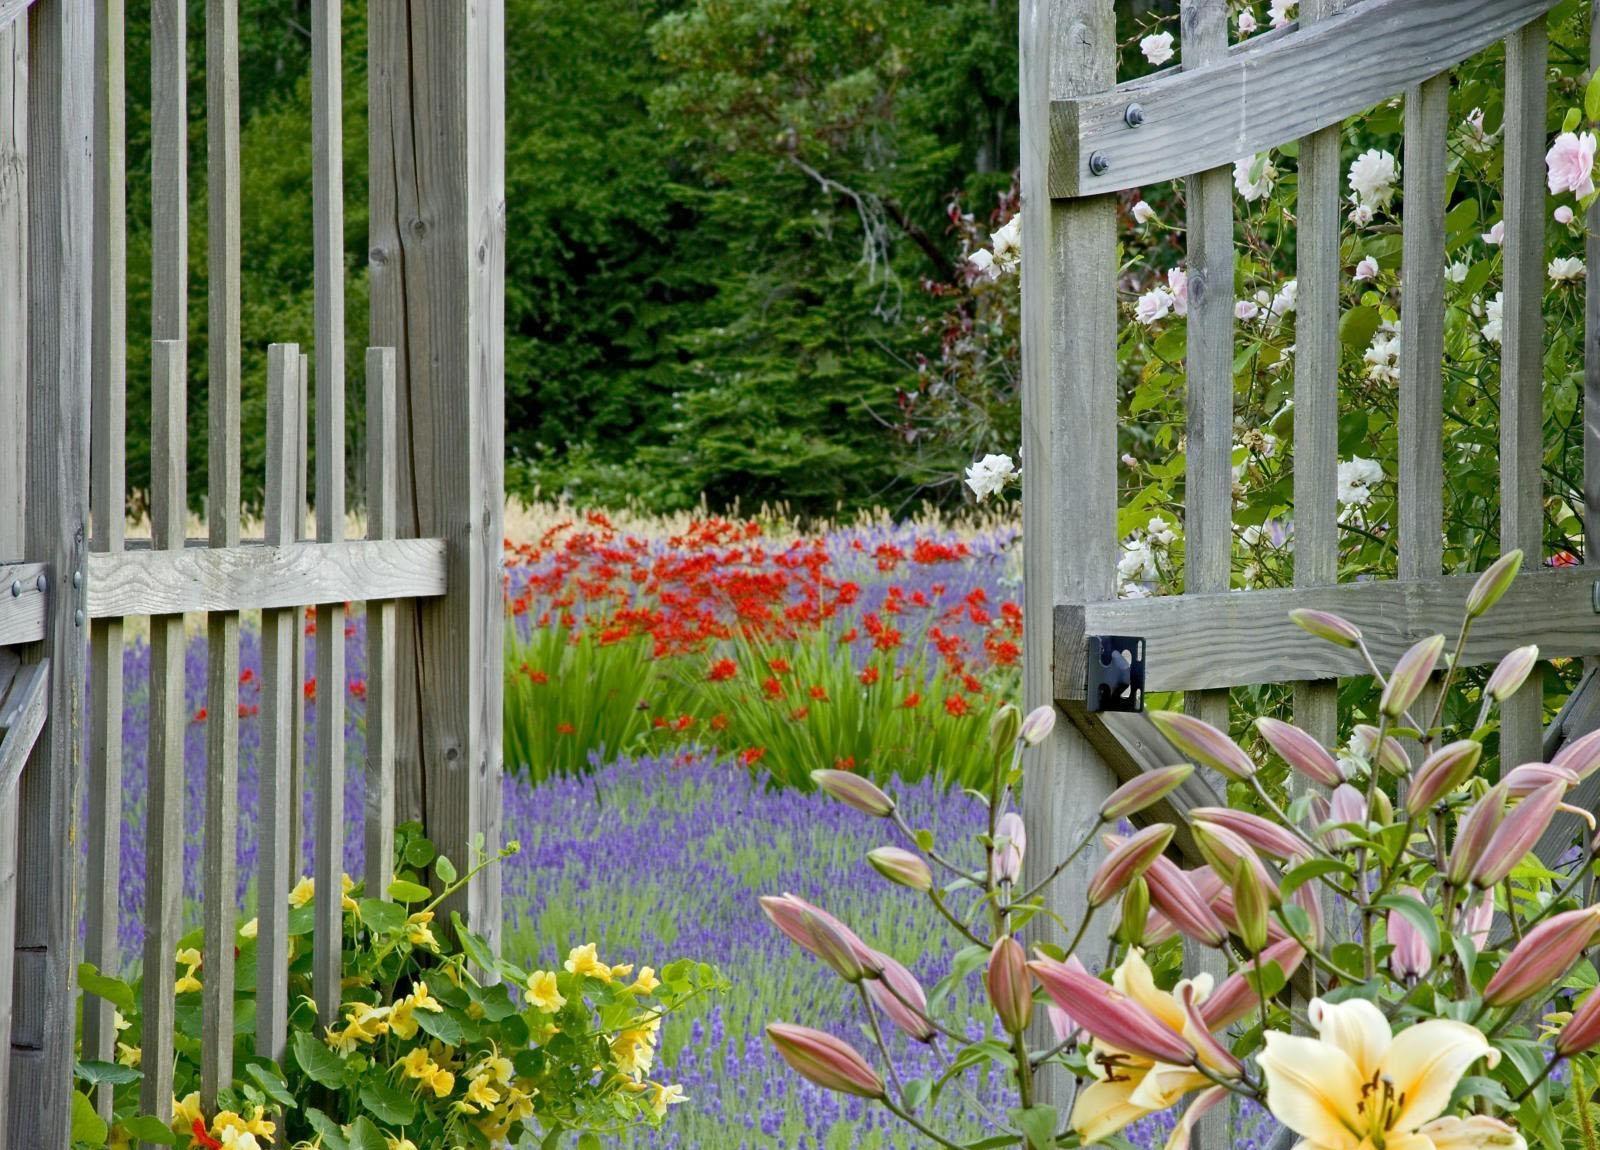 Hintergrundbilder Garten Grün Lavendel Zaun Tore Hütte